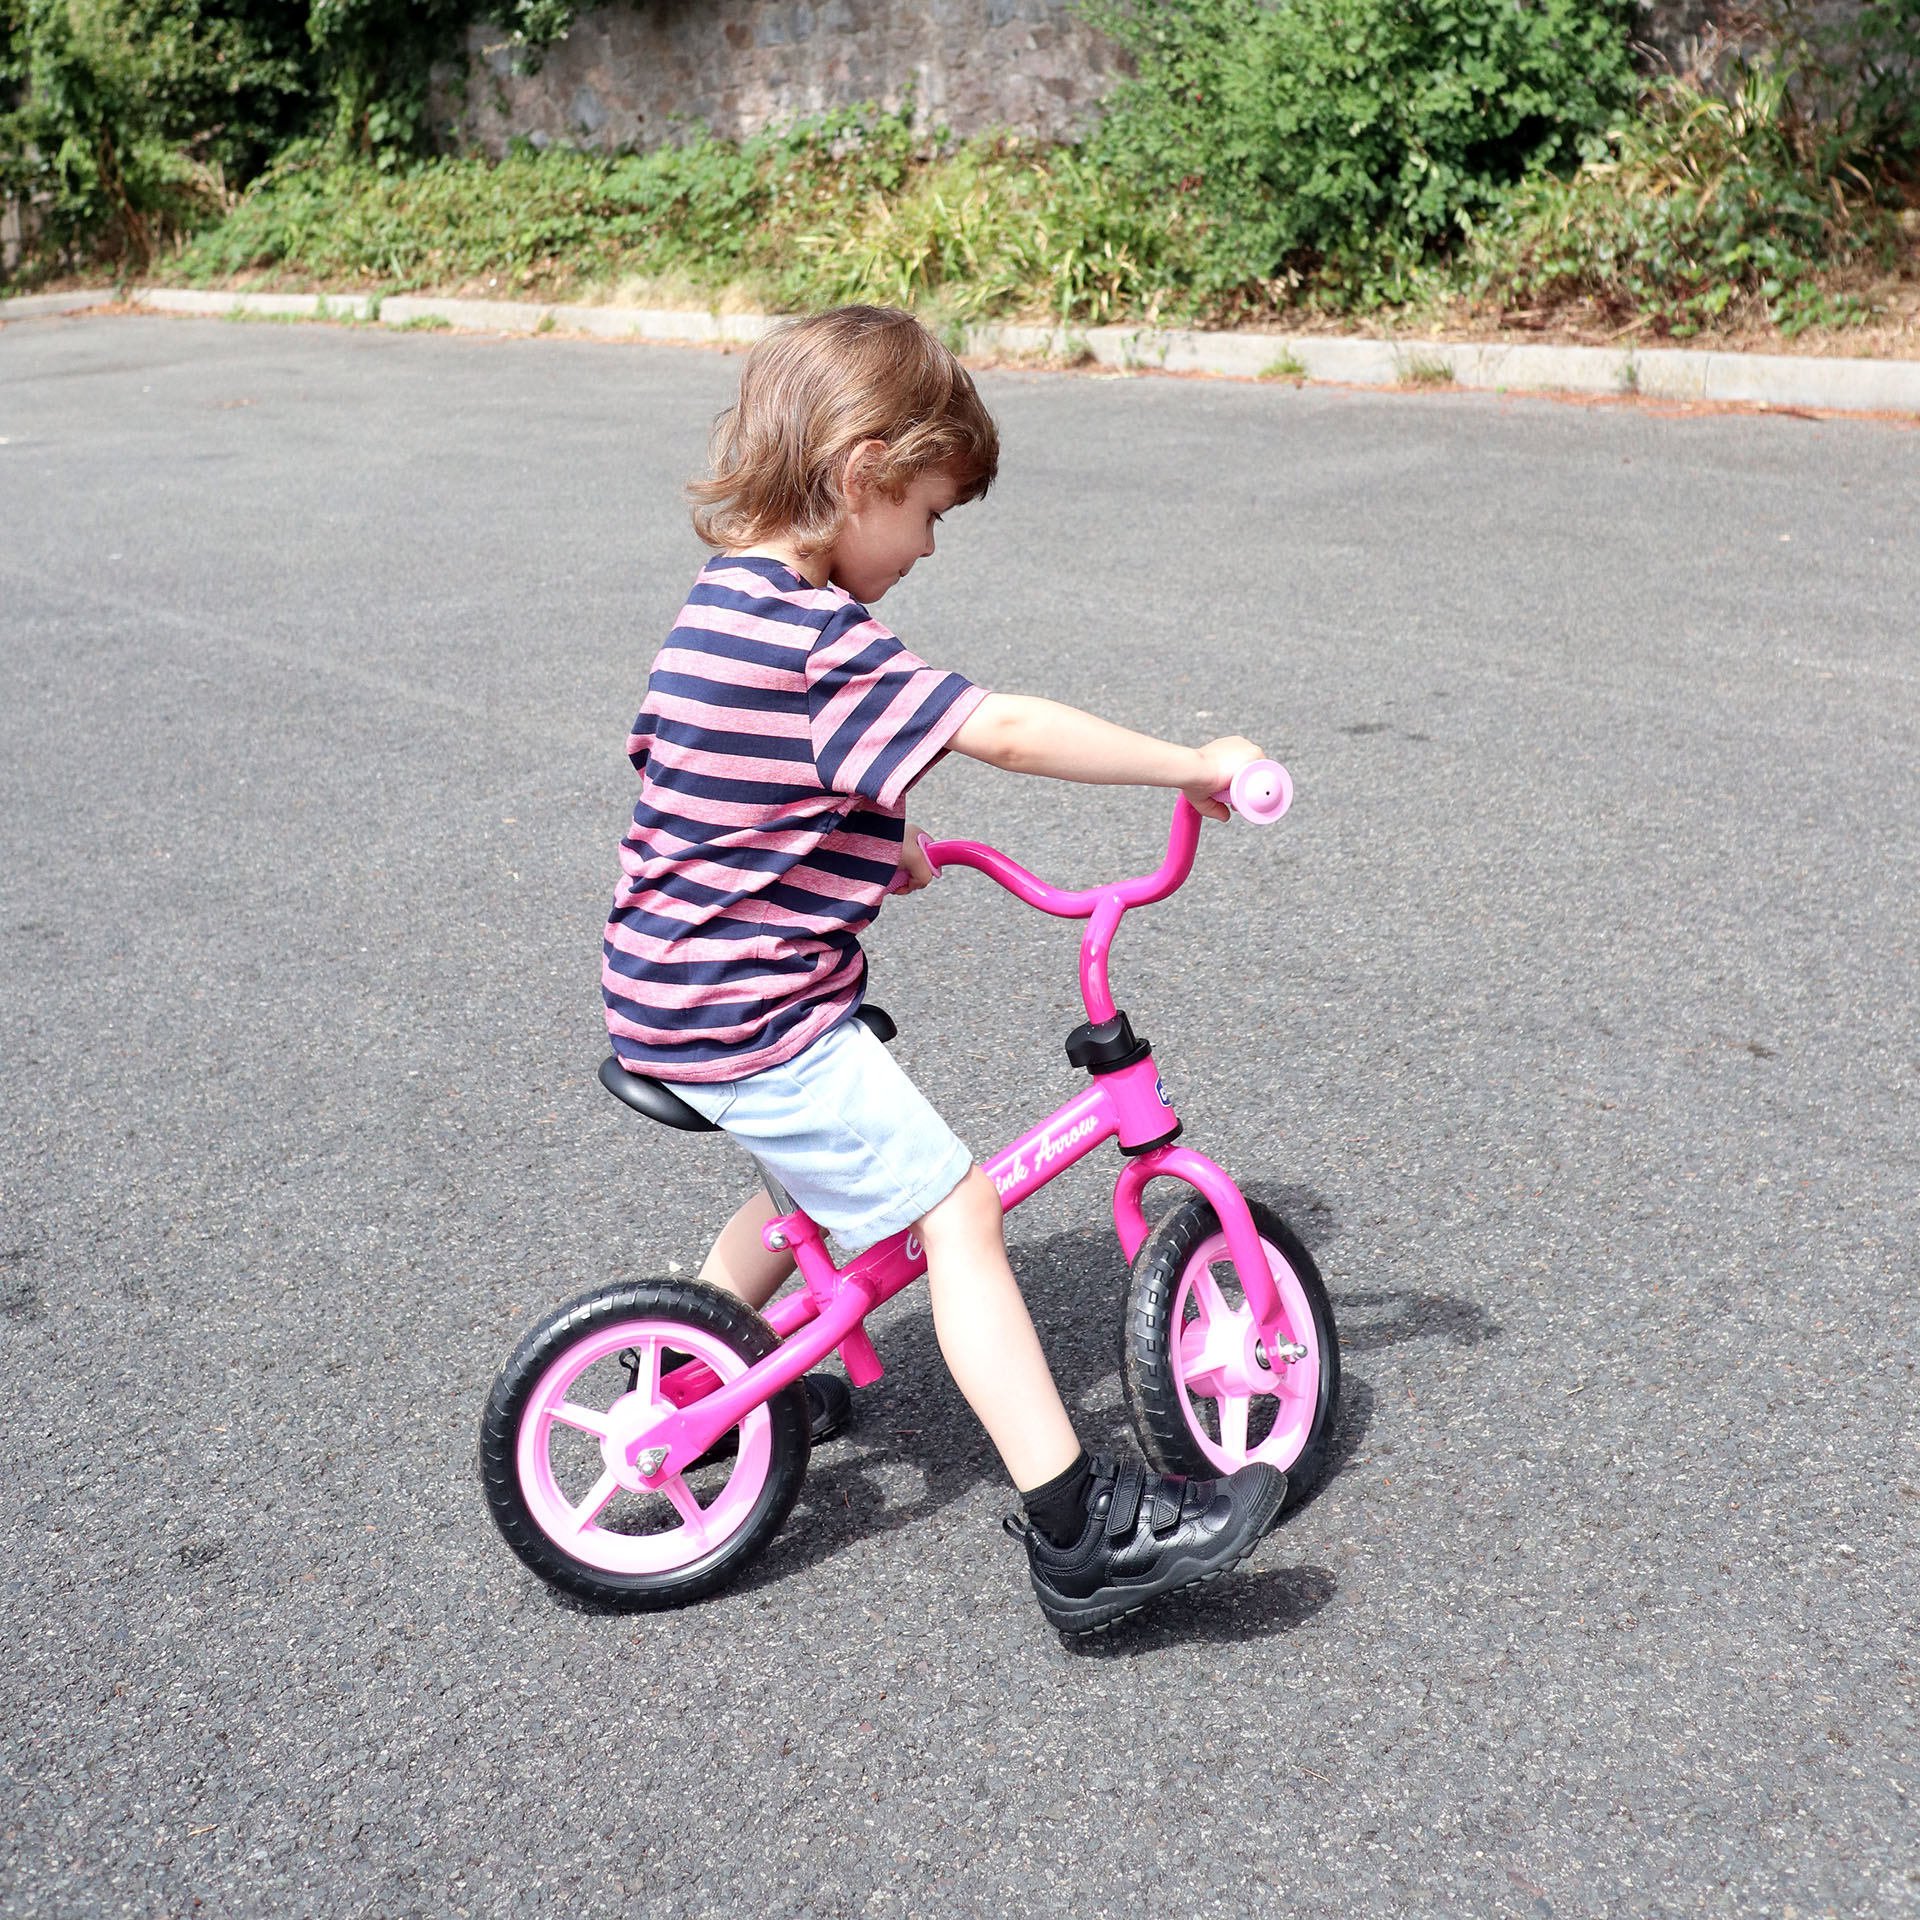 Child riding balance bike wearing Start-Rite Extreme school shoes